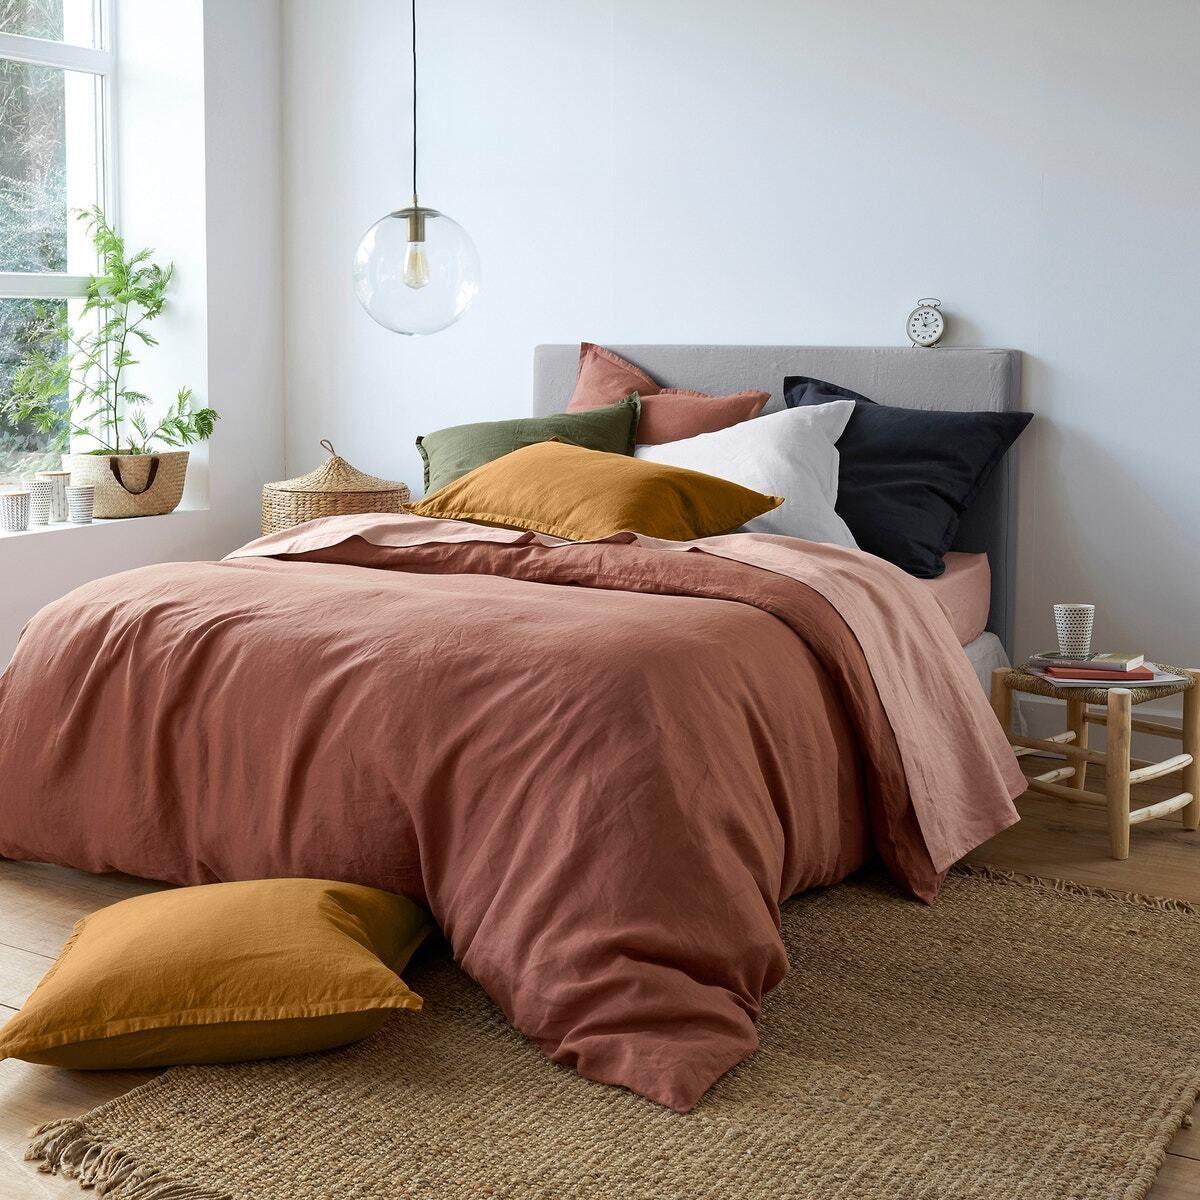 Best linen bedding: 14 eco-friendly bedding sets